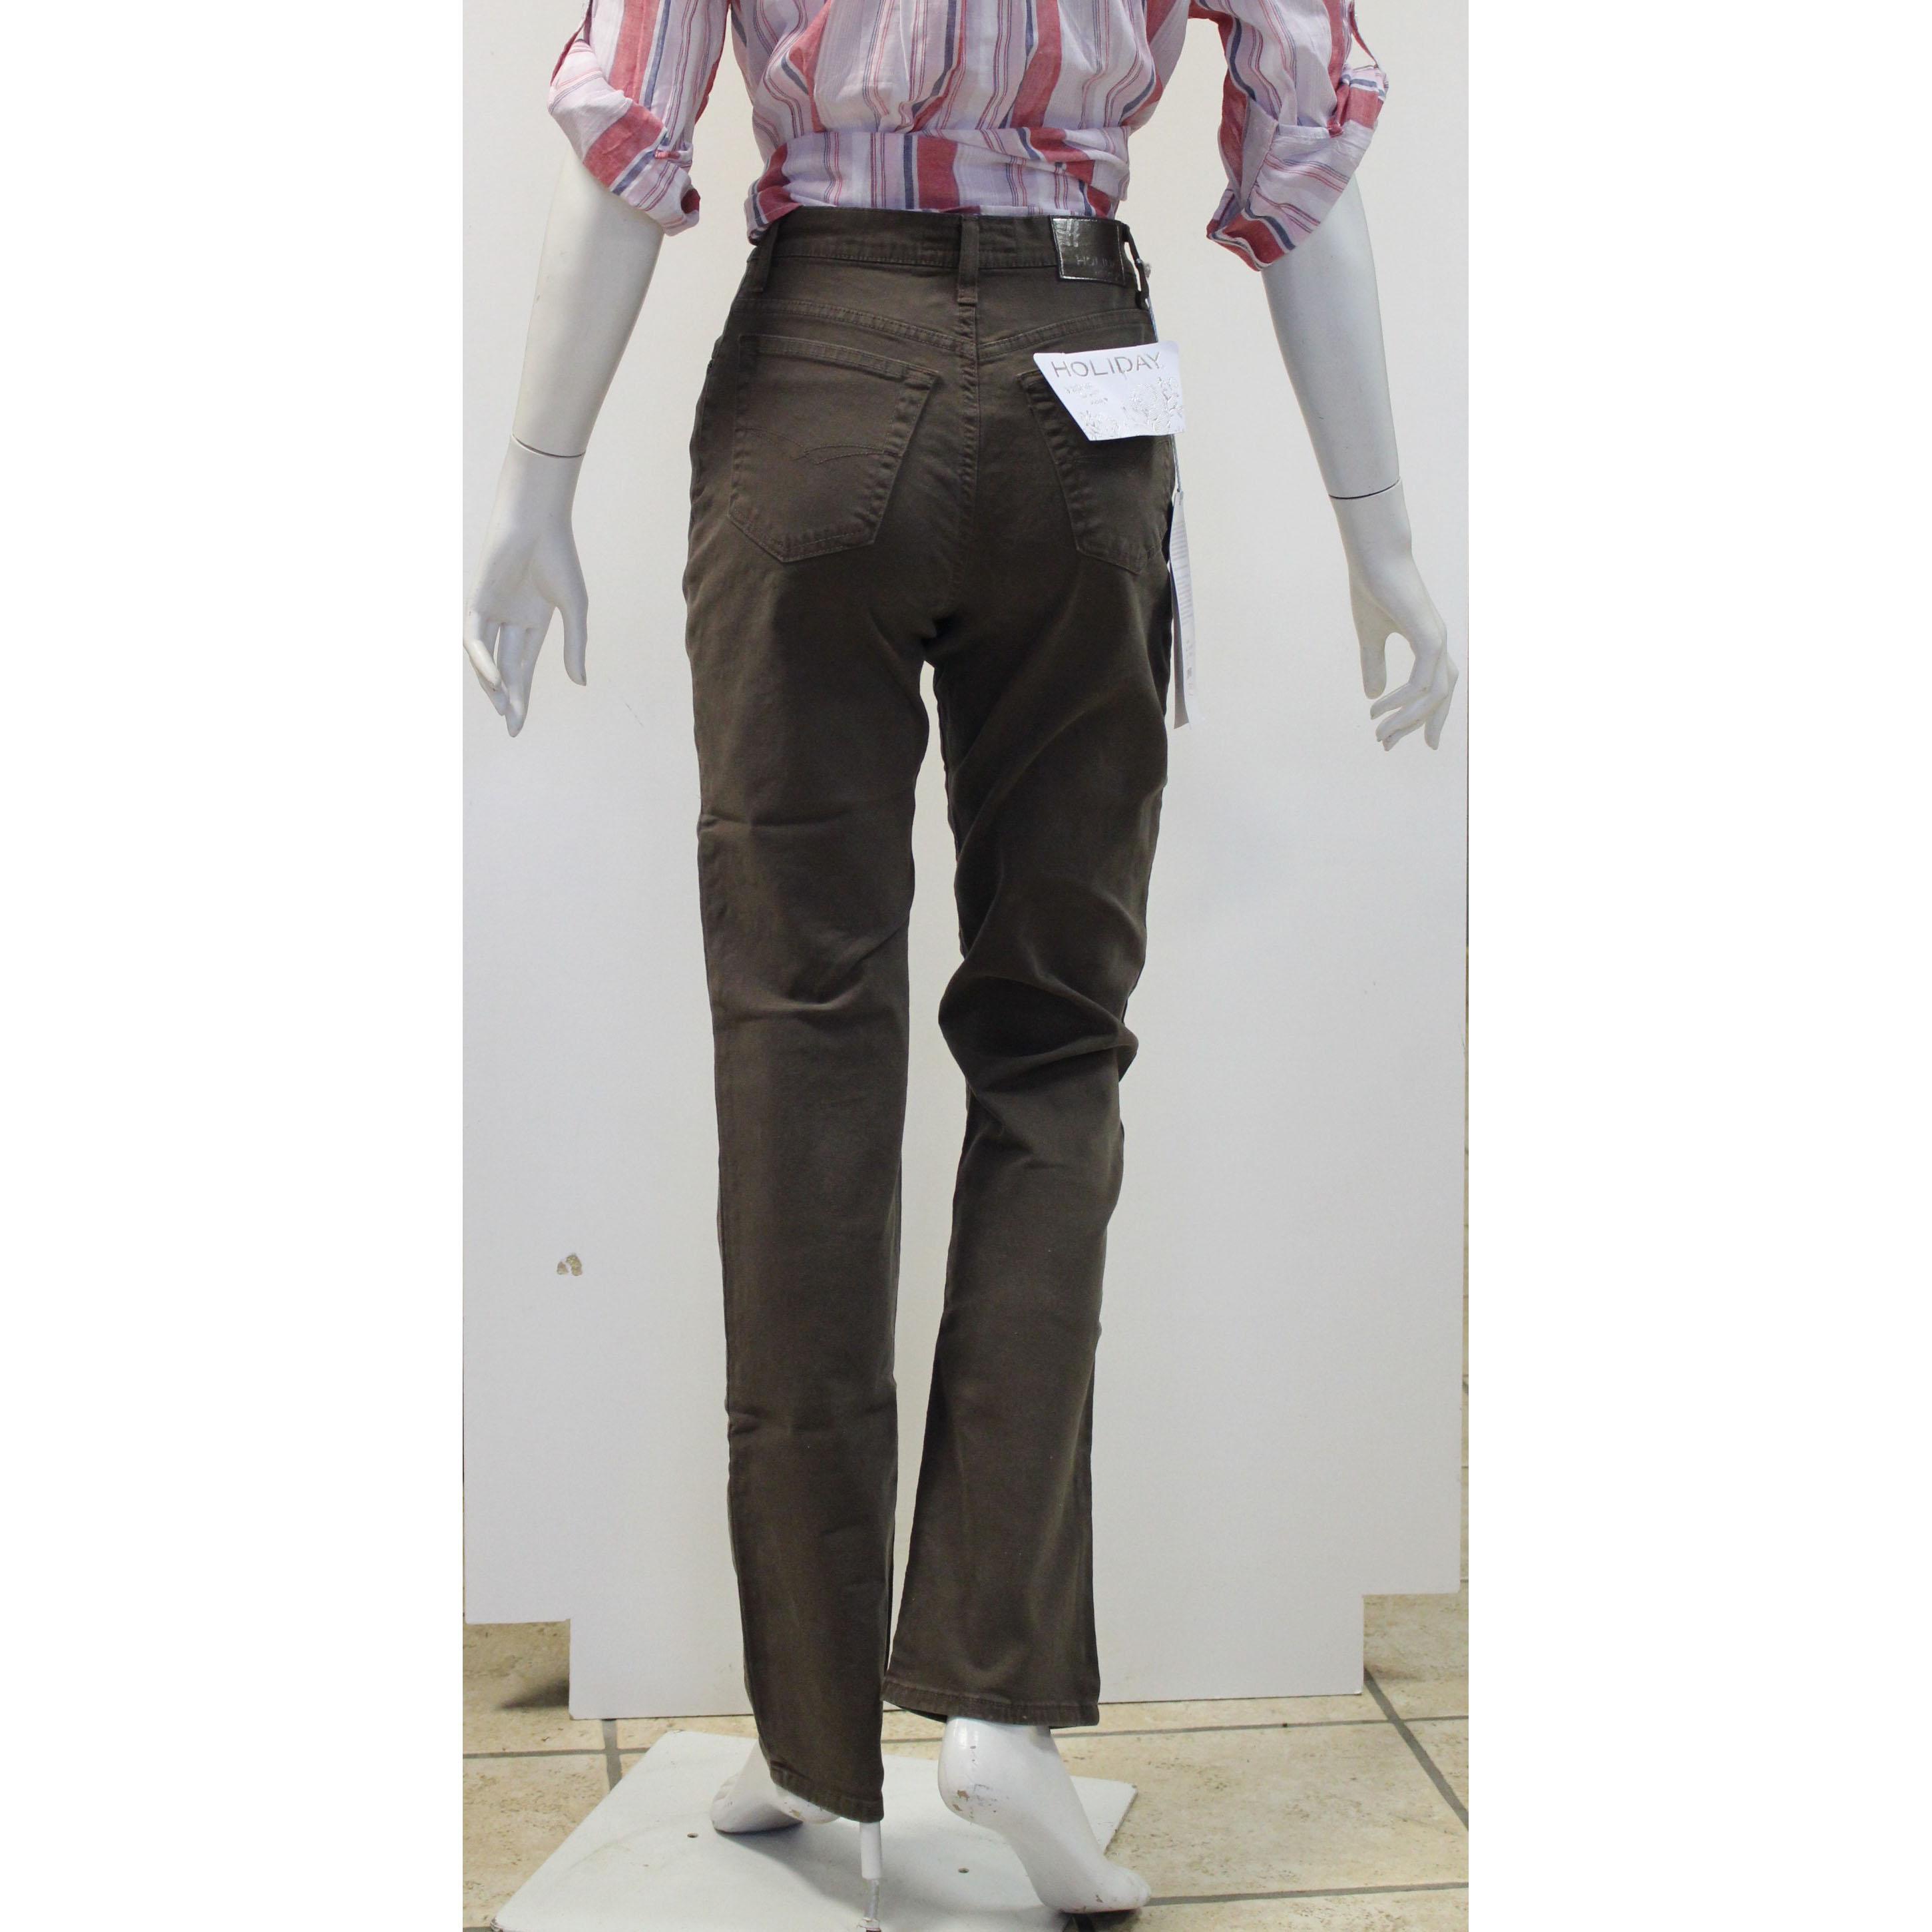 Jeans Alta Jeans Donna Donna UnicaVita OffertaVestibilita' vb7fgY6y